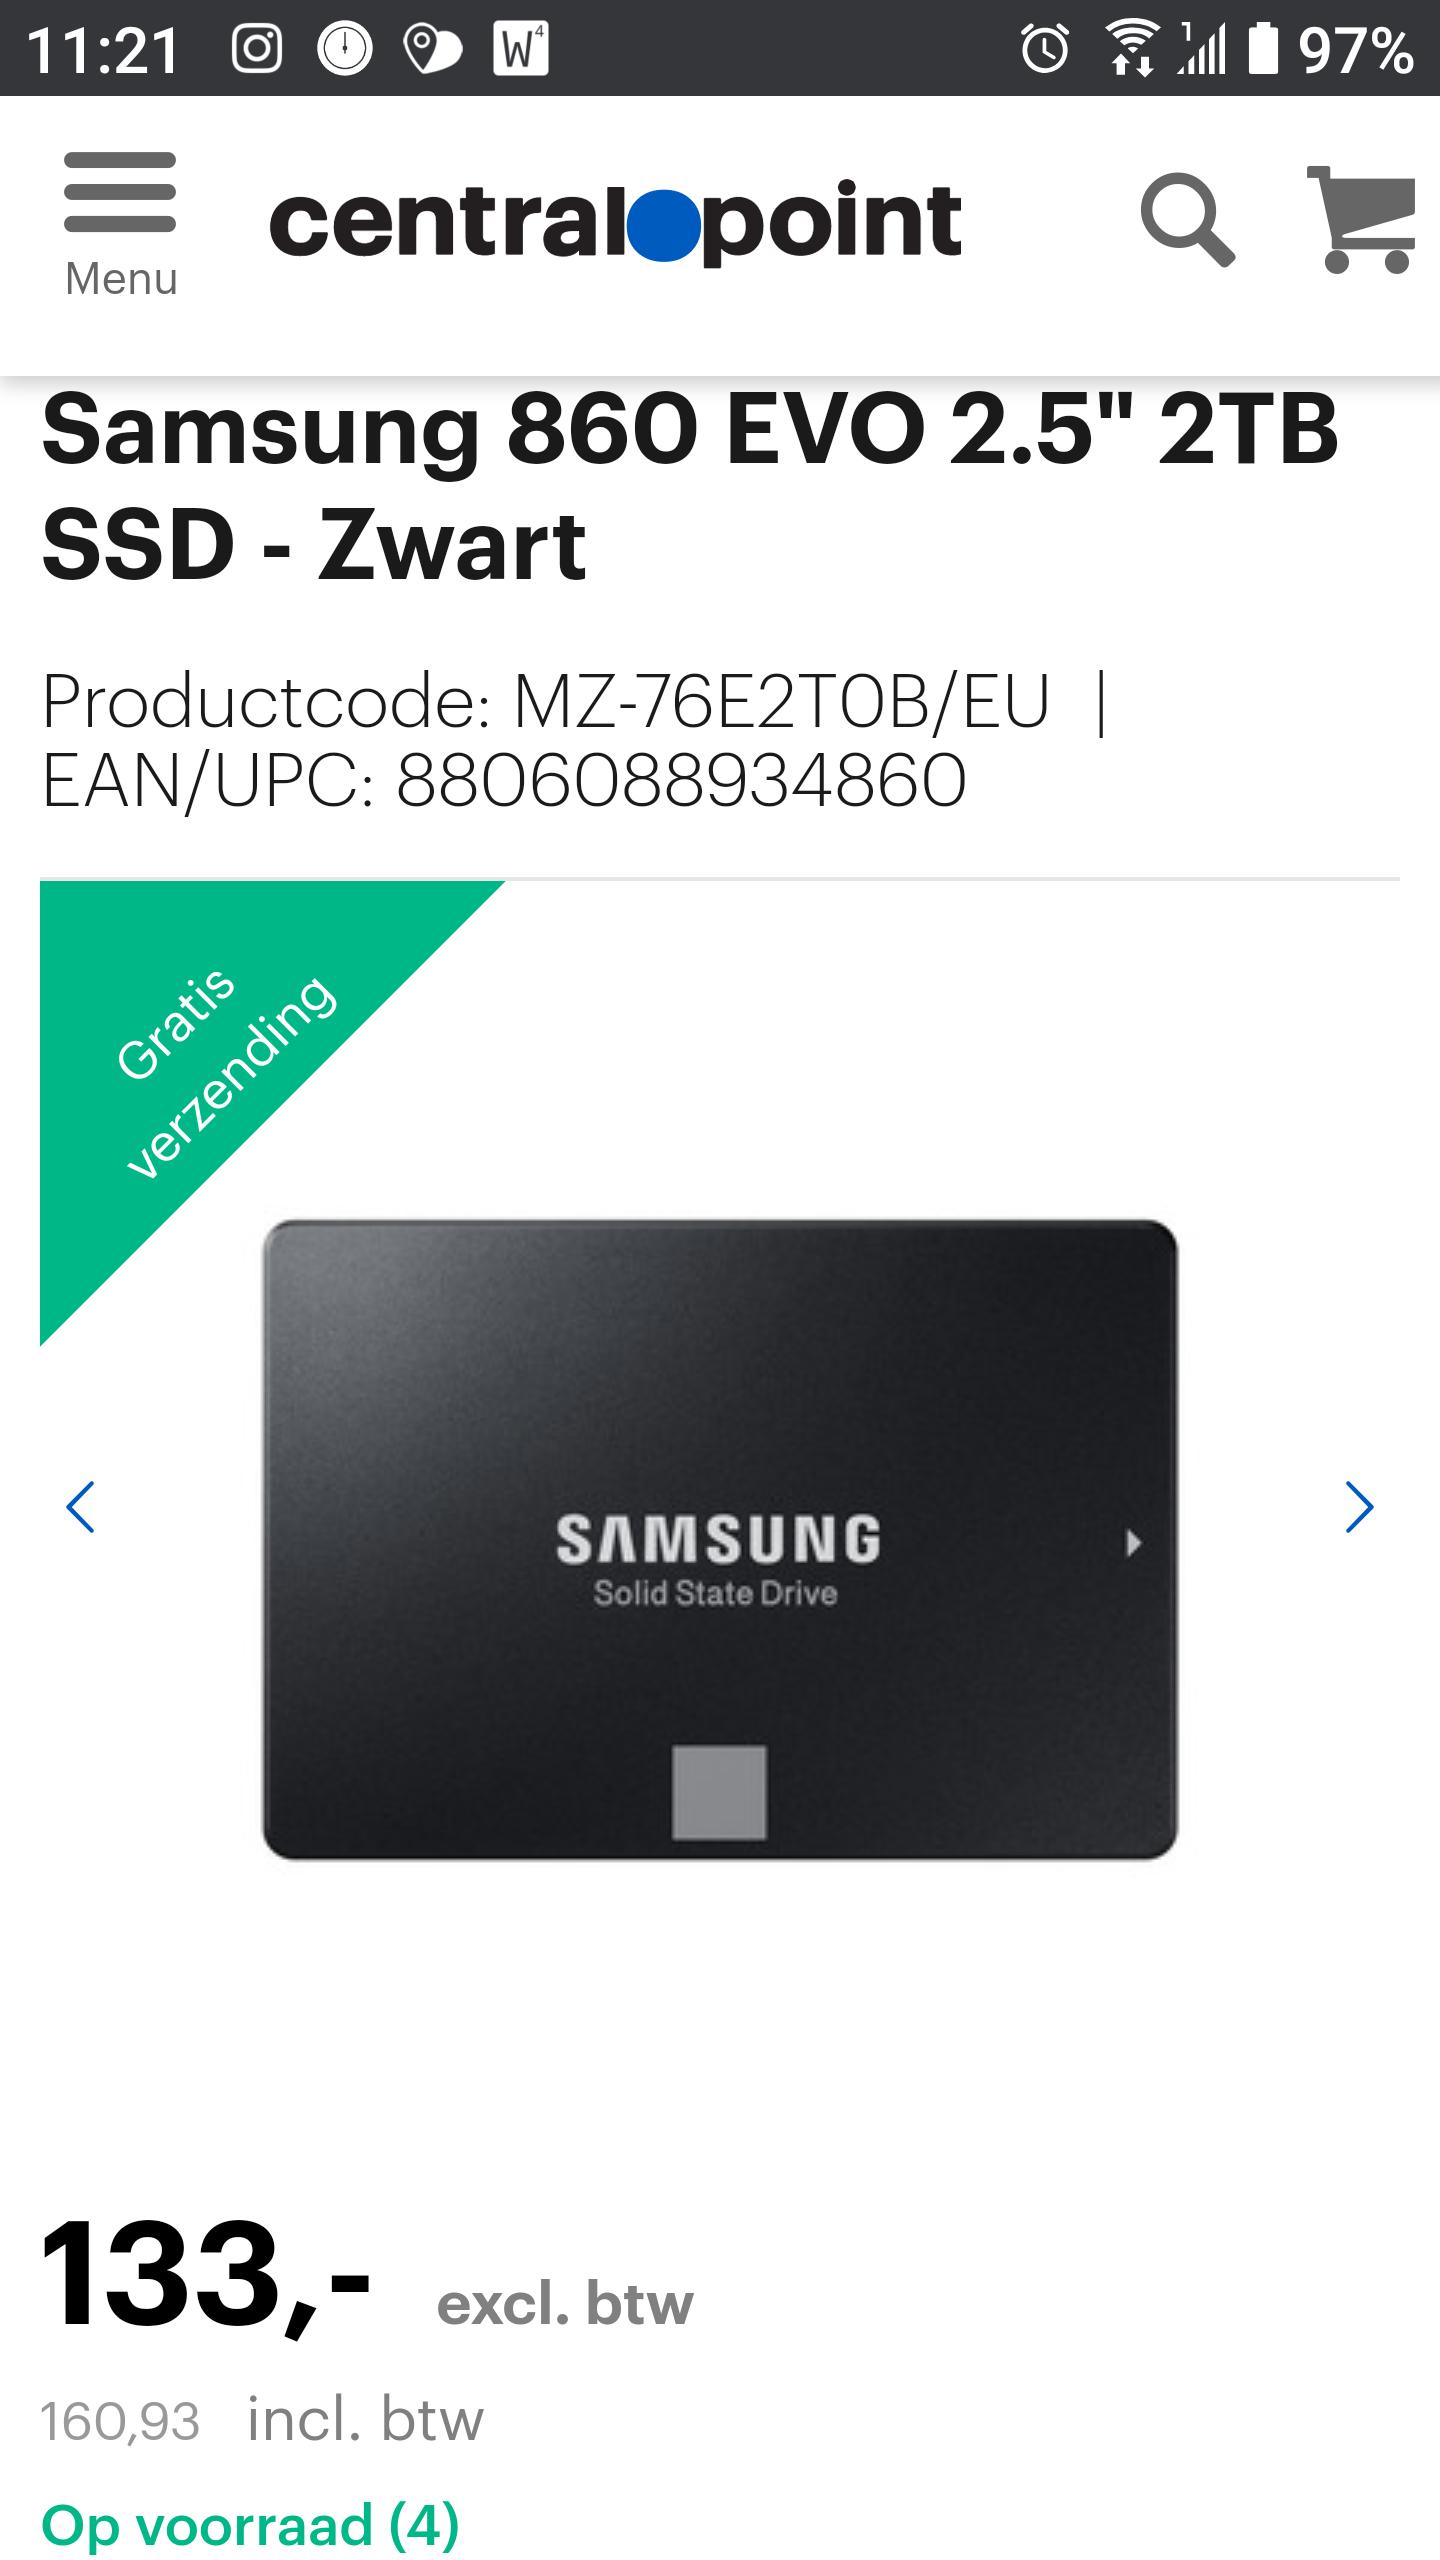 "Samsung 860 EVO 2.5"" 2TB SSD - Zwart"